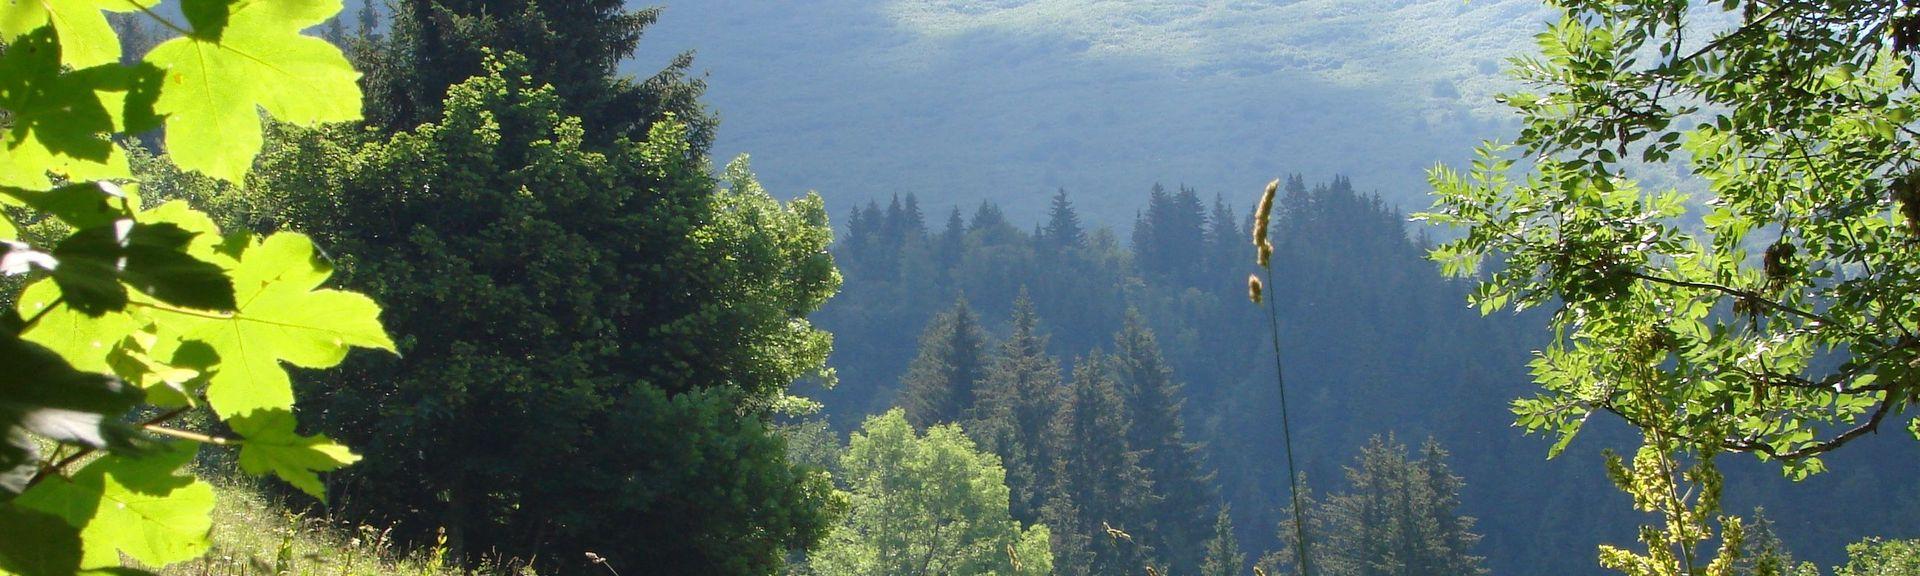 La Chambre, Auvergne-Rhône-Alpes, France